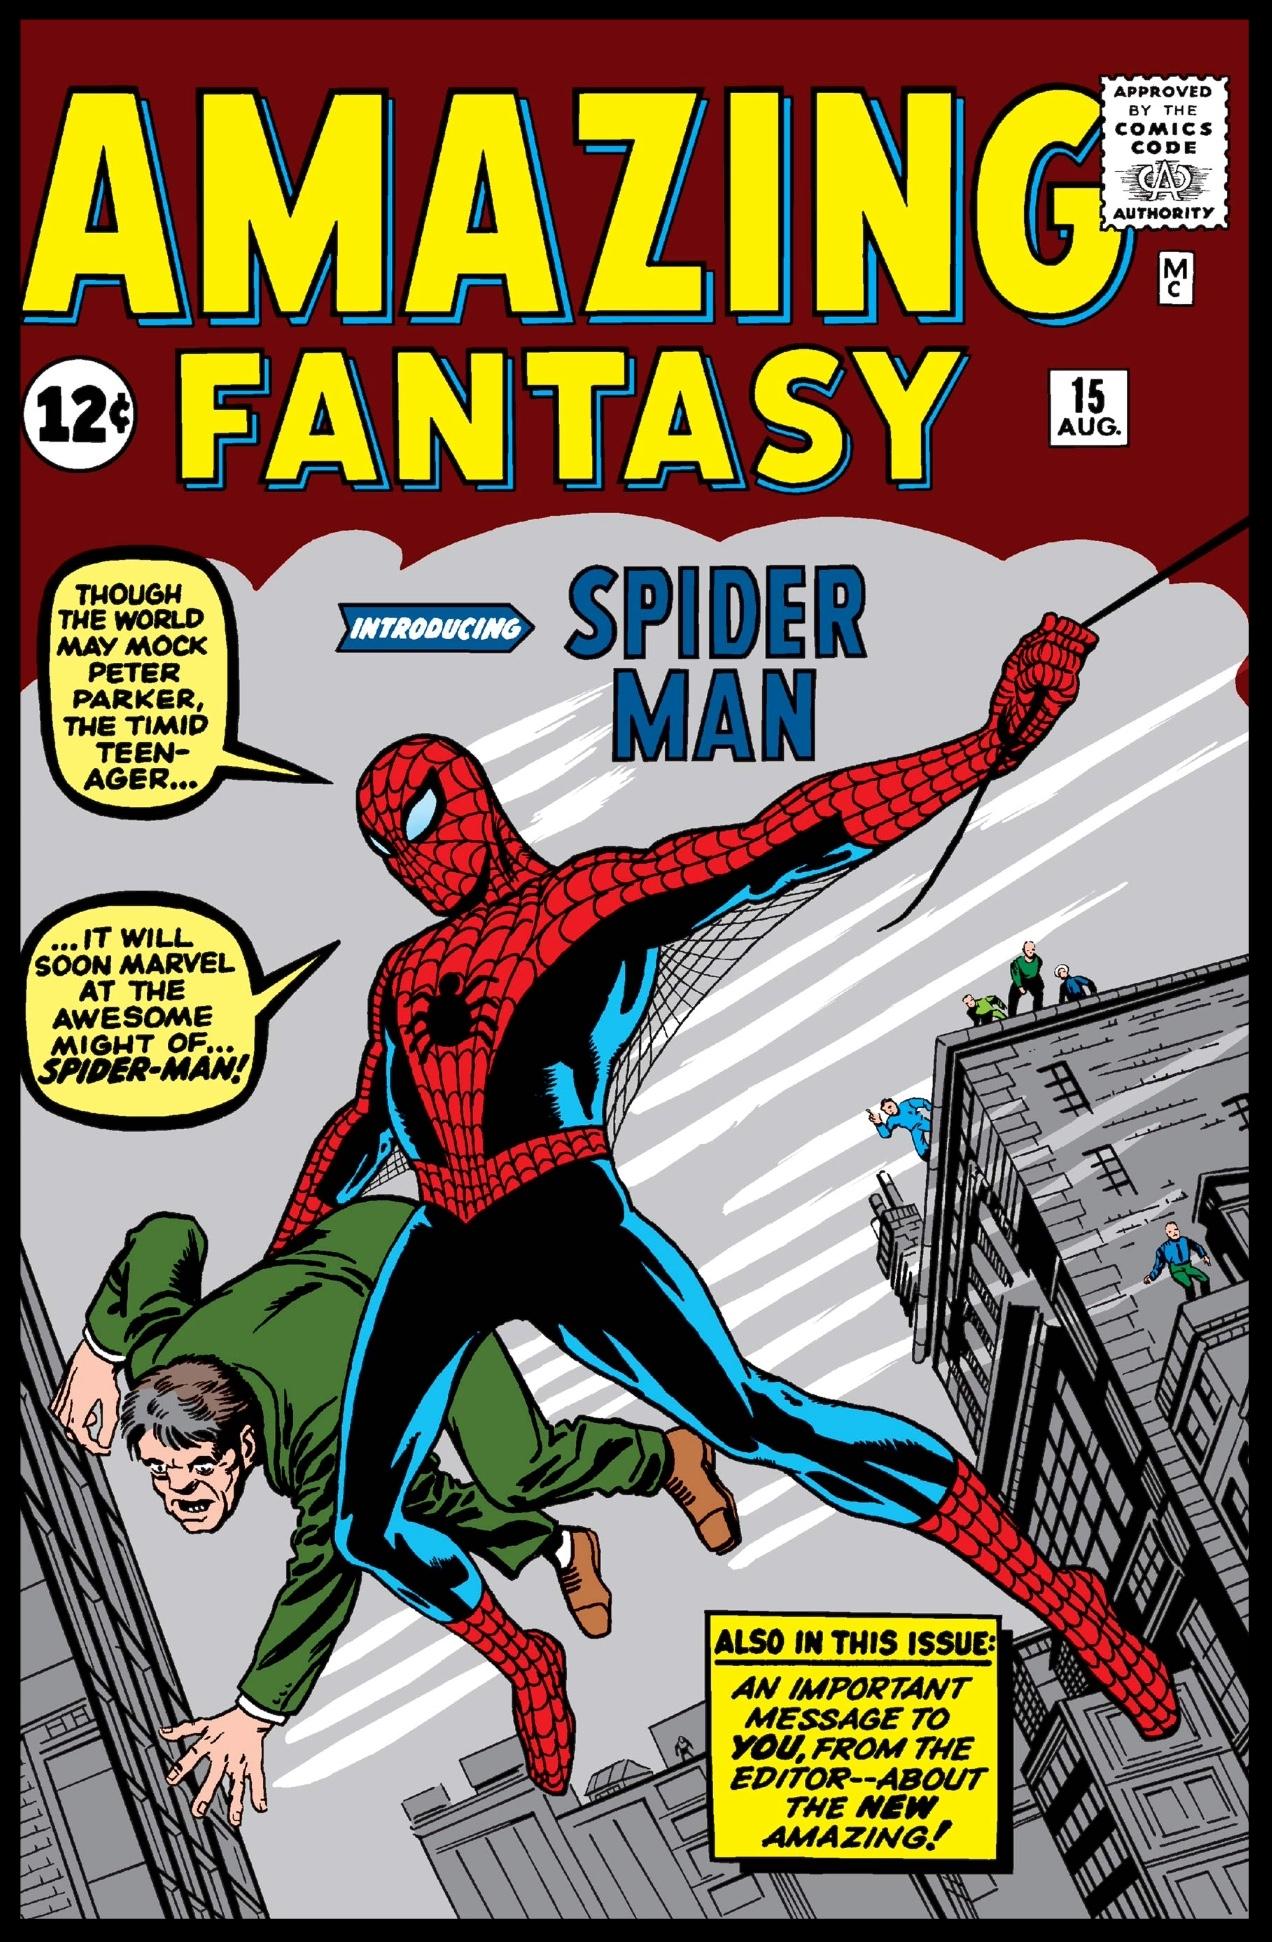 Amazing Fantasy #15 Cover